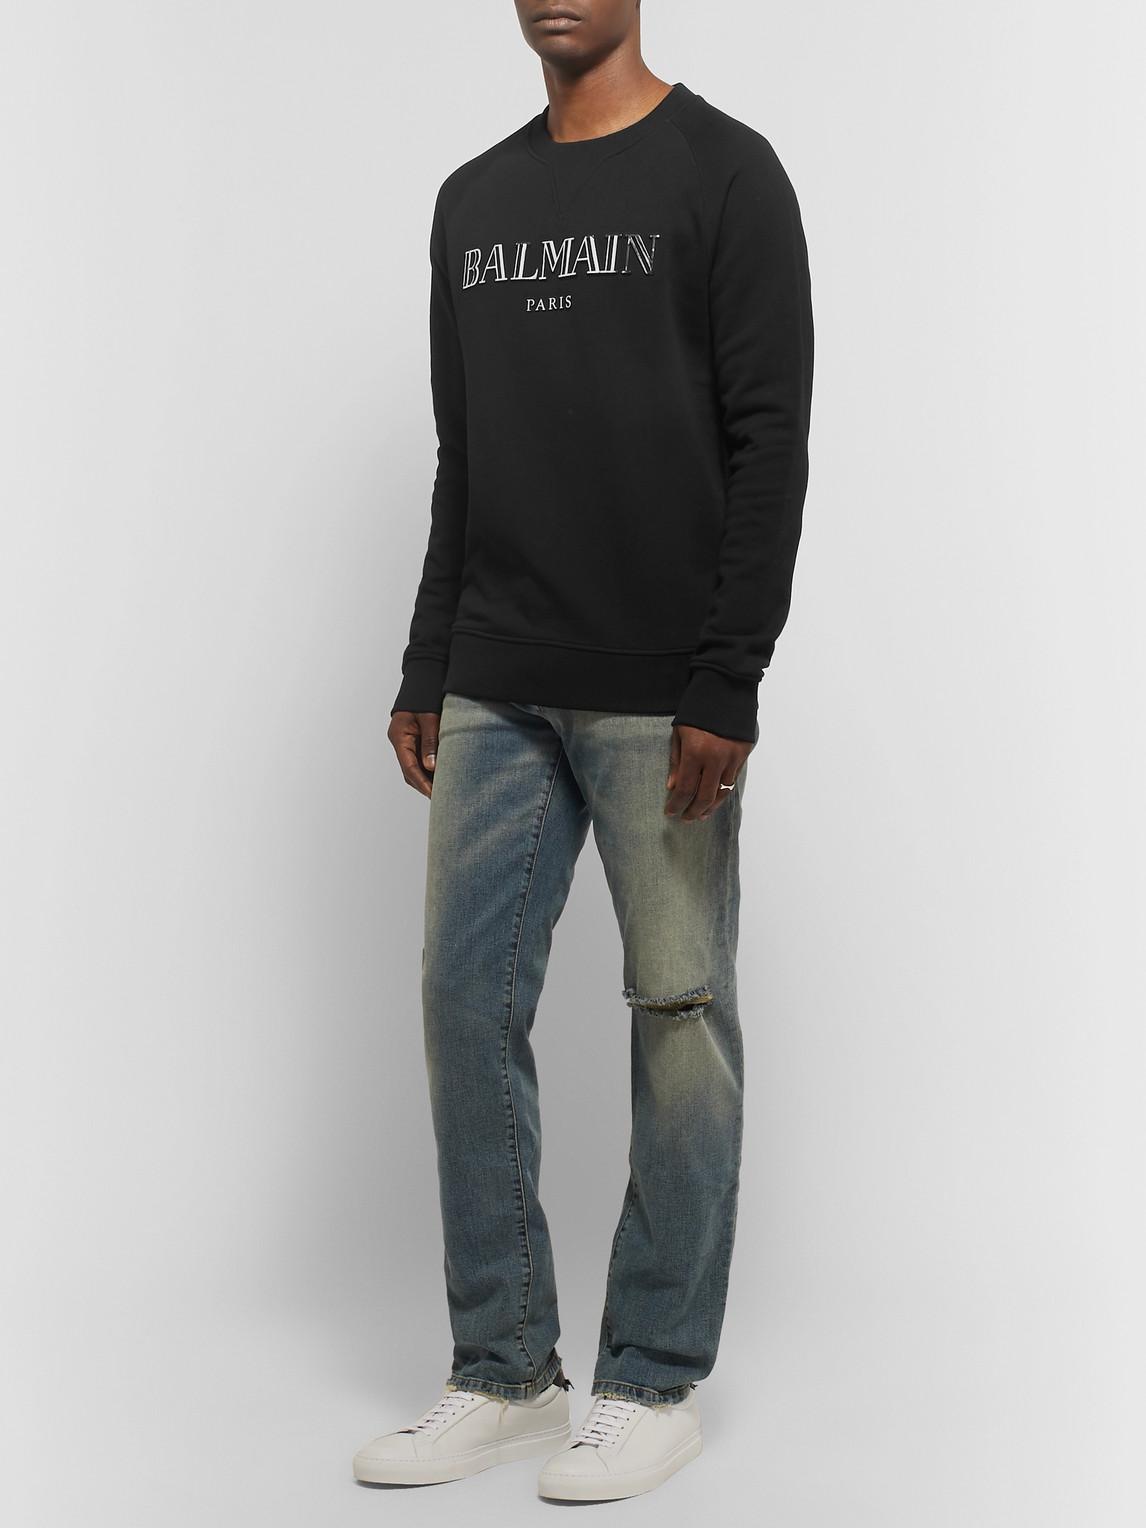 Balmain T-shirts METALLIC LOGO-PRINT LOOPBACK COTTON-JERSEY SWEATSHIRT